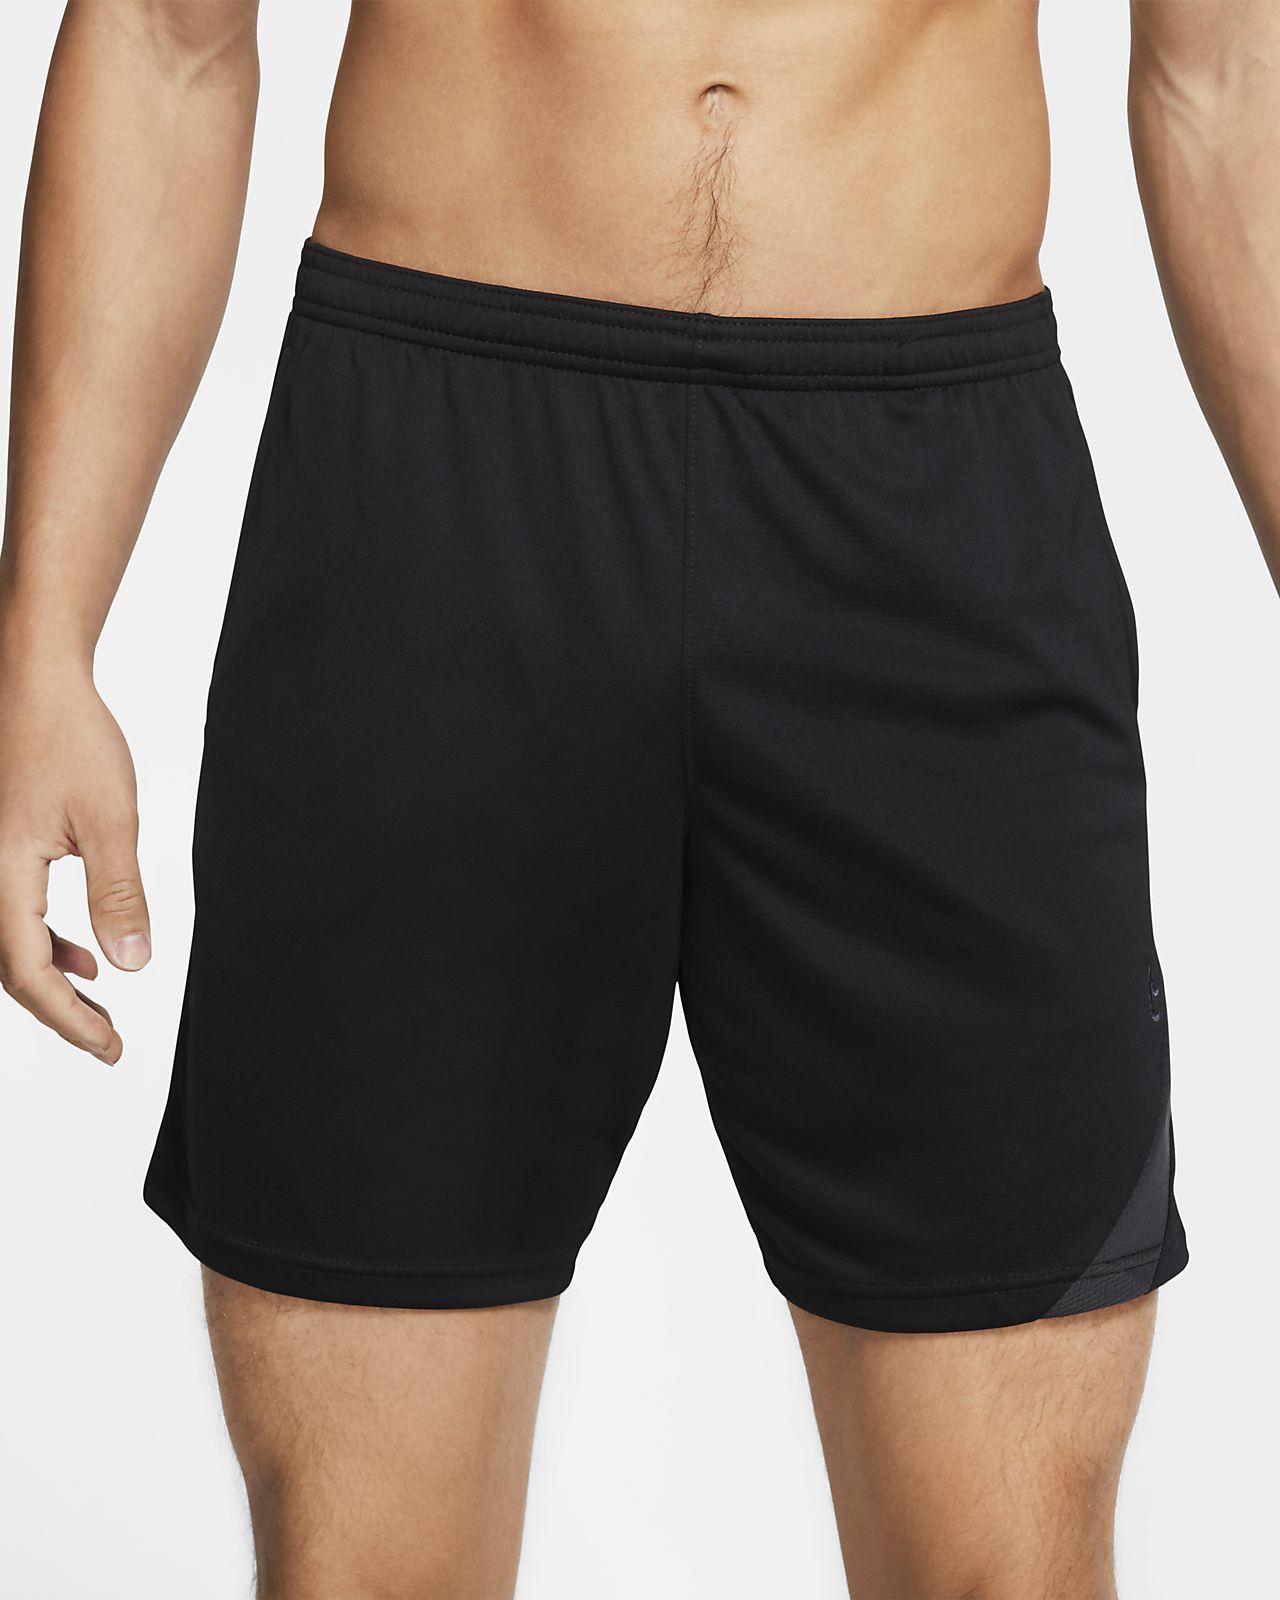 Nike Dri-FIT Academy Pro Men's Soccer Shorts